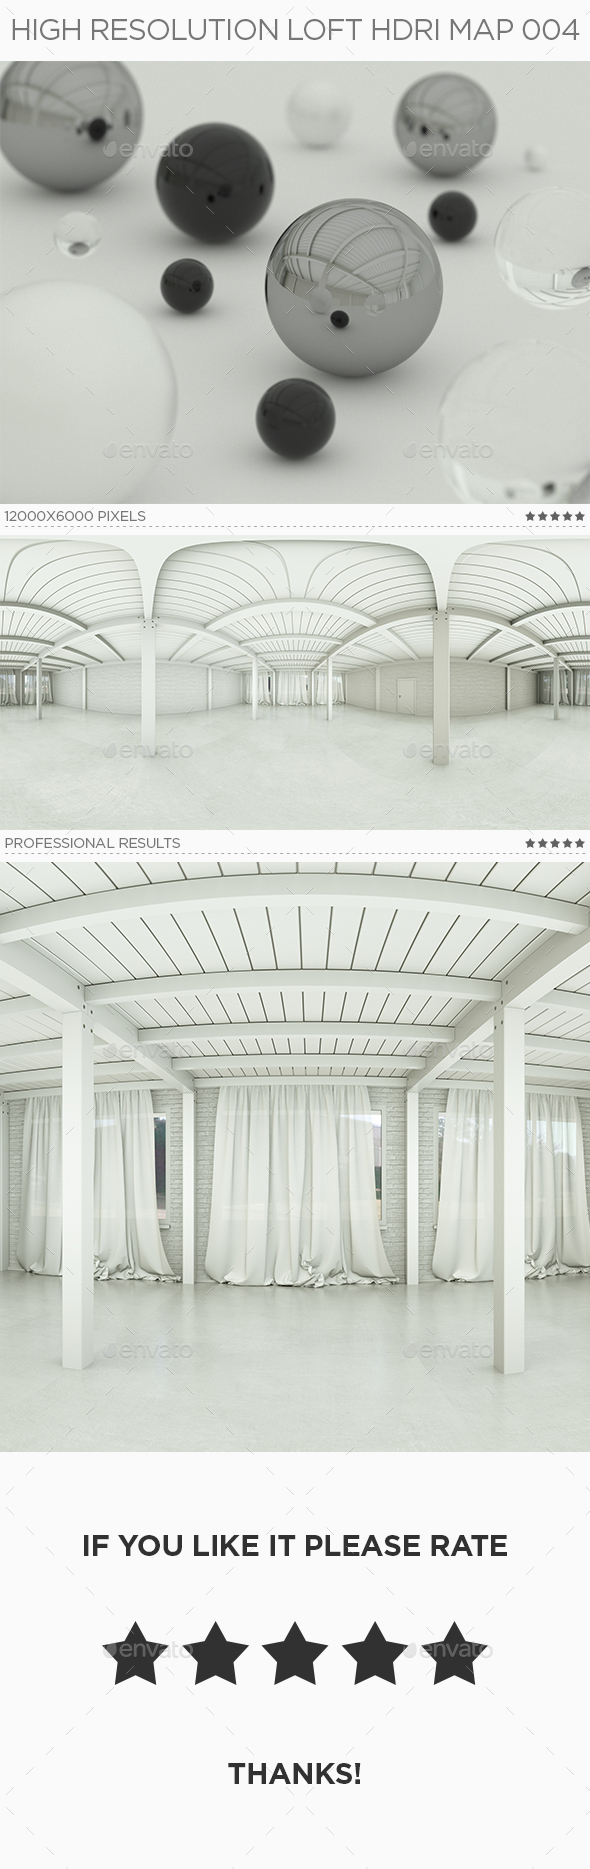 High Resolution Loft HDRi Map 004 - 3DOcean Item for Sale